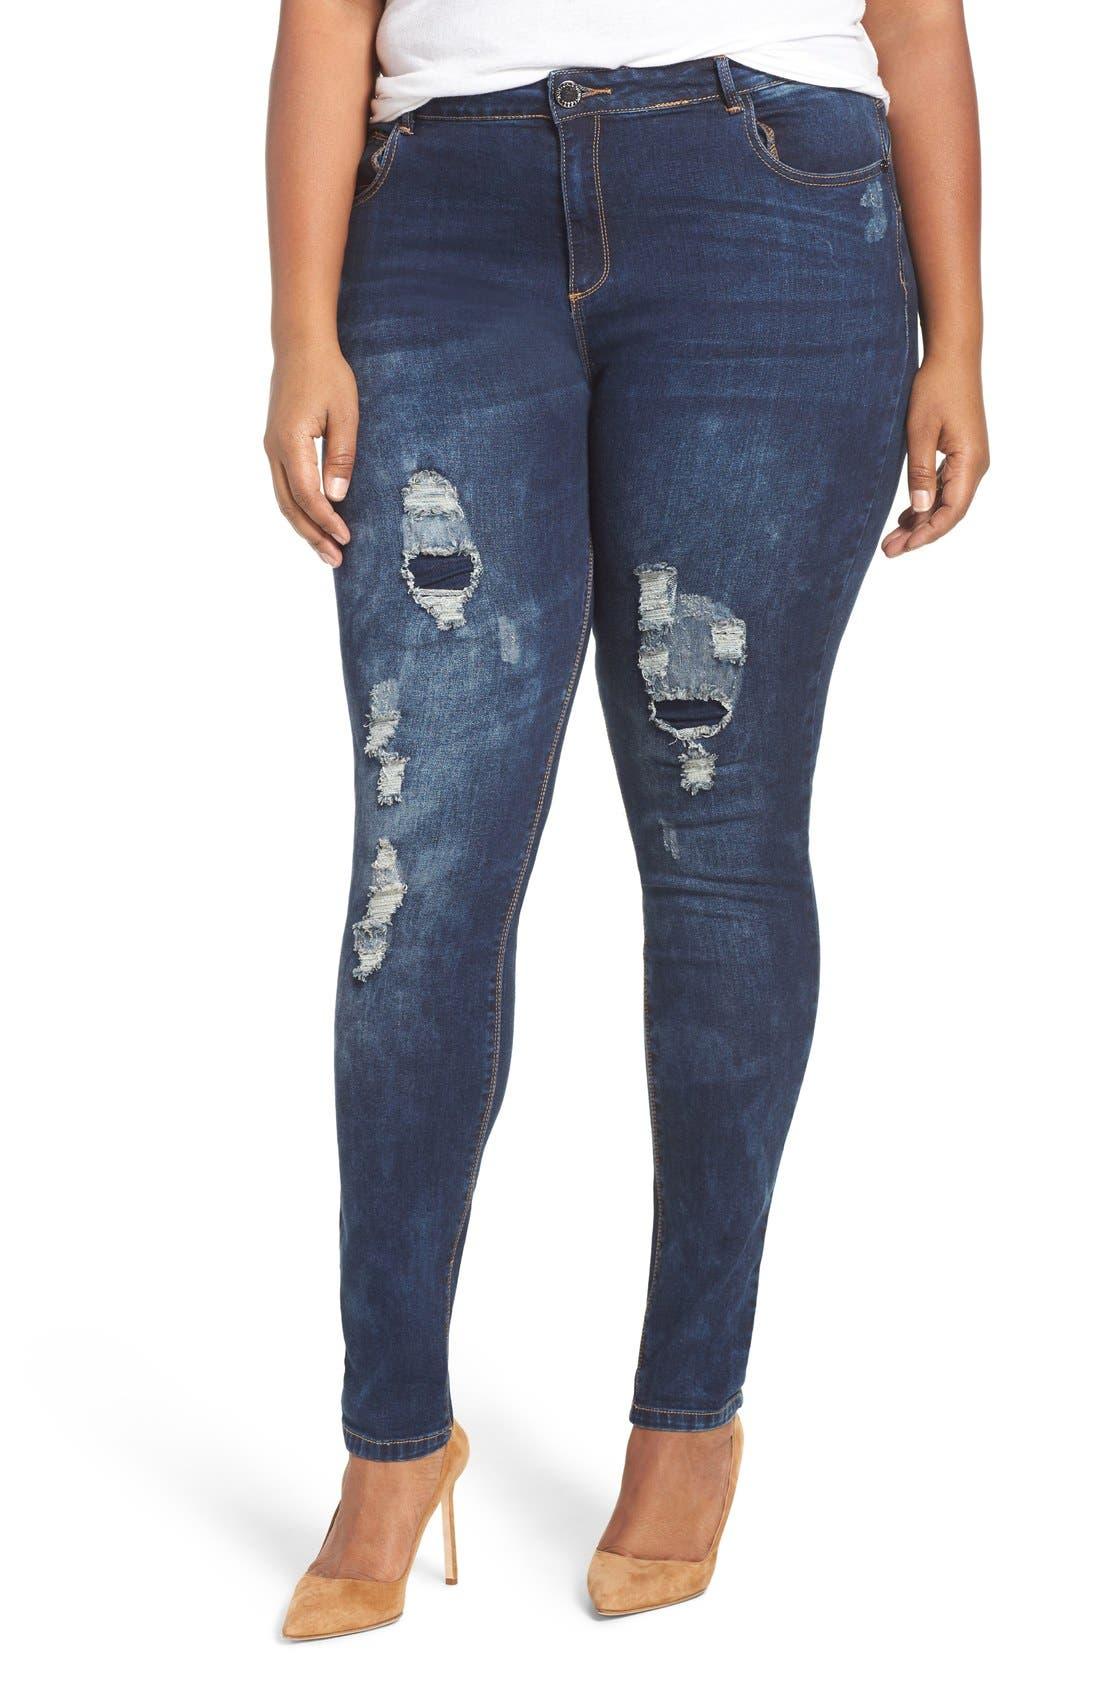 'Dismantle' Ripped Stretch Skinny Jeans,                             Alternate thumbnail 4, color,                             DARK DENIM